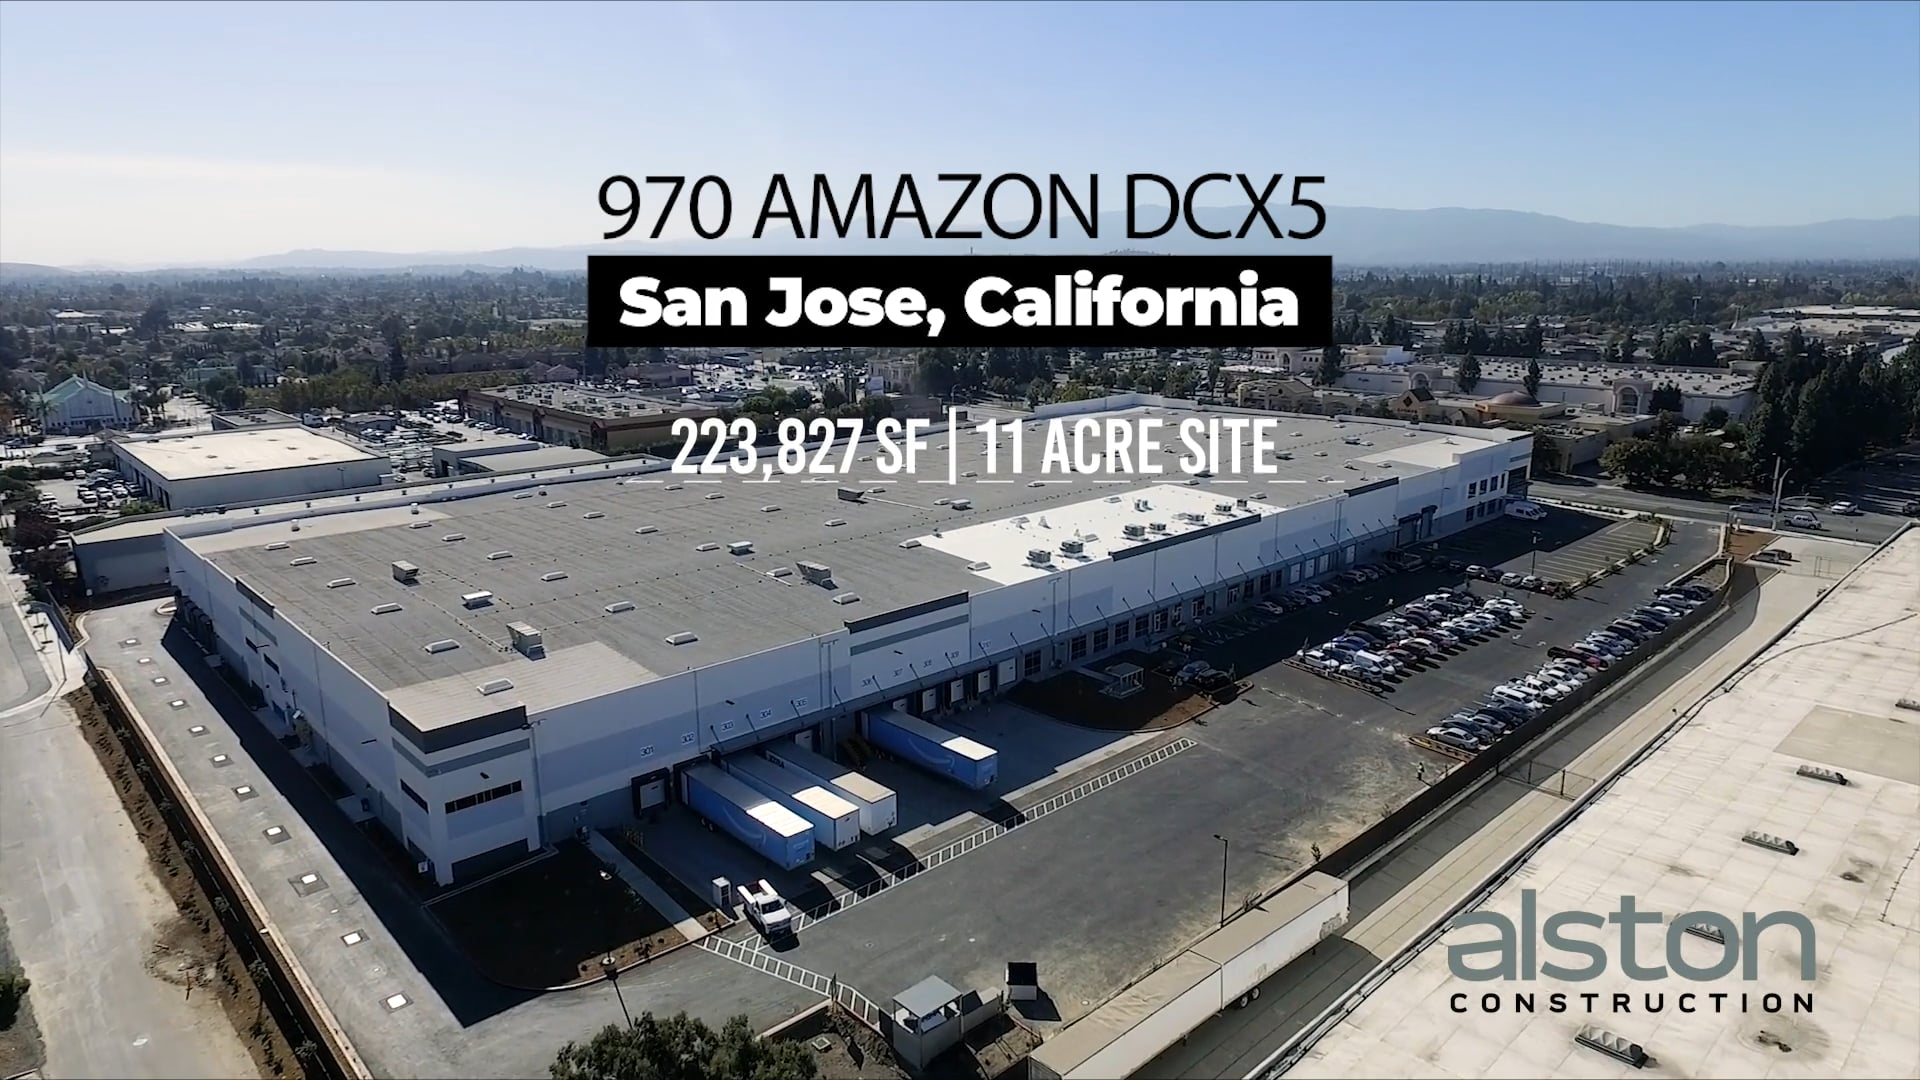 Commercial Real Estate   Amazon DCX5